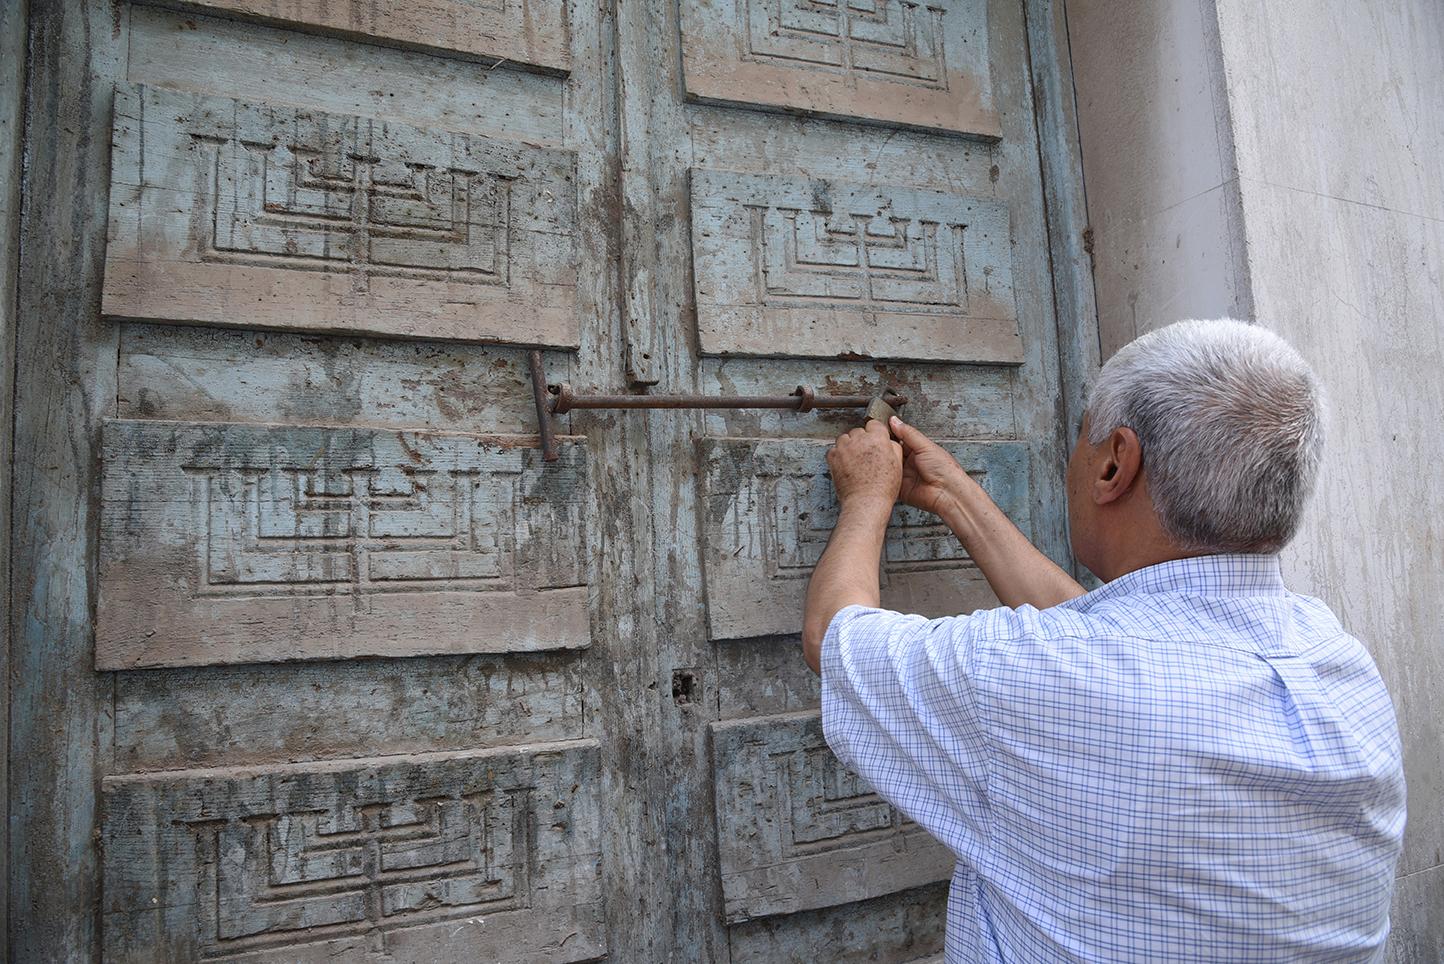 Hafsia synagogue front door. Tunis, Tunisia